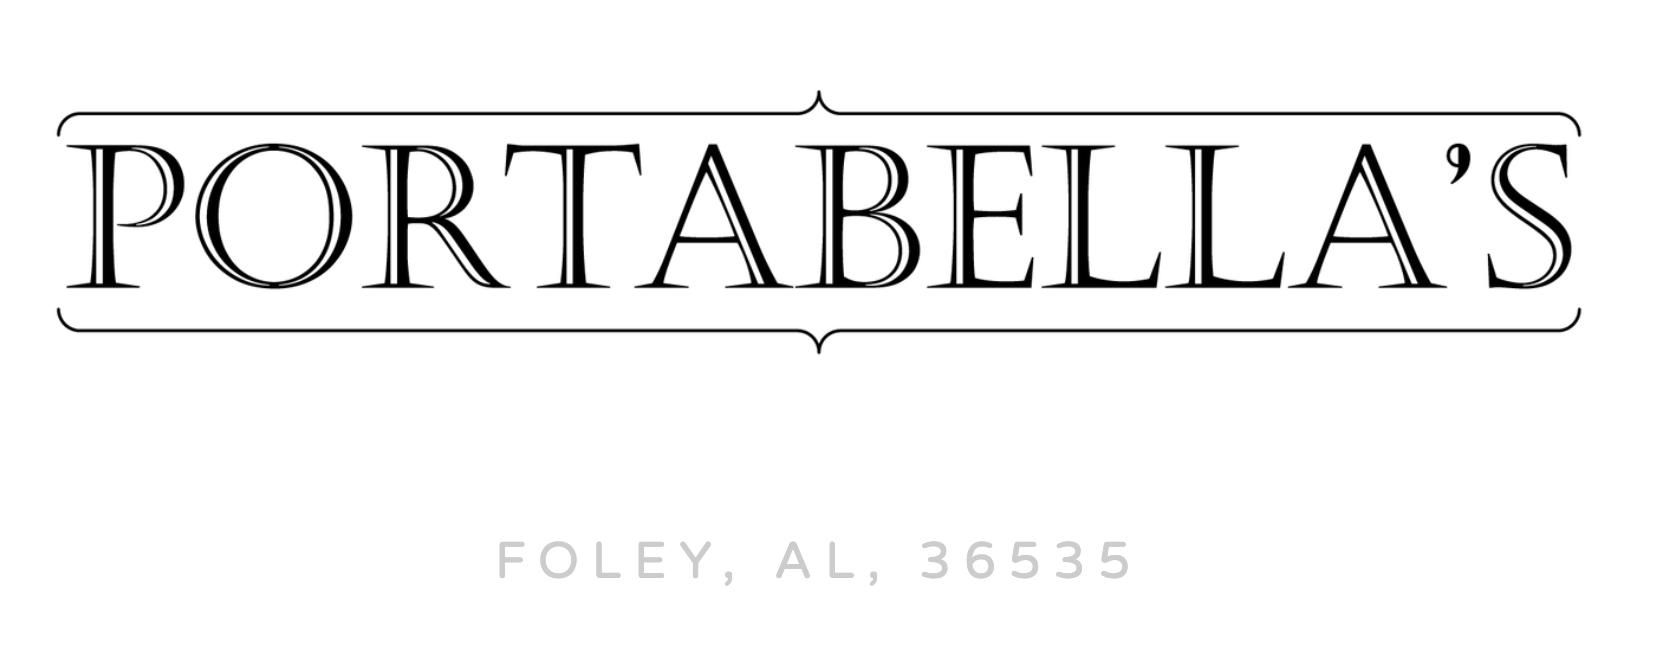 Portabella's in Foley